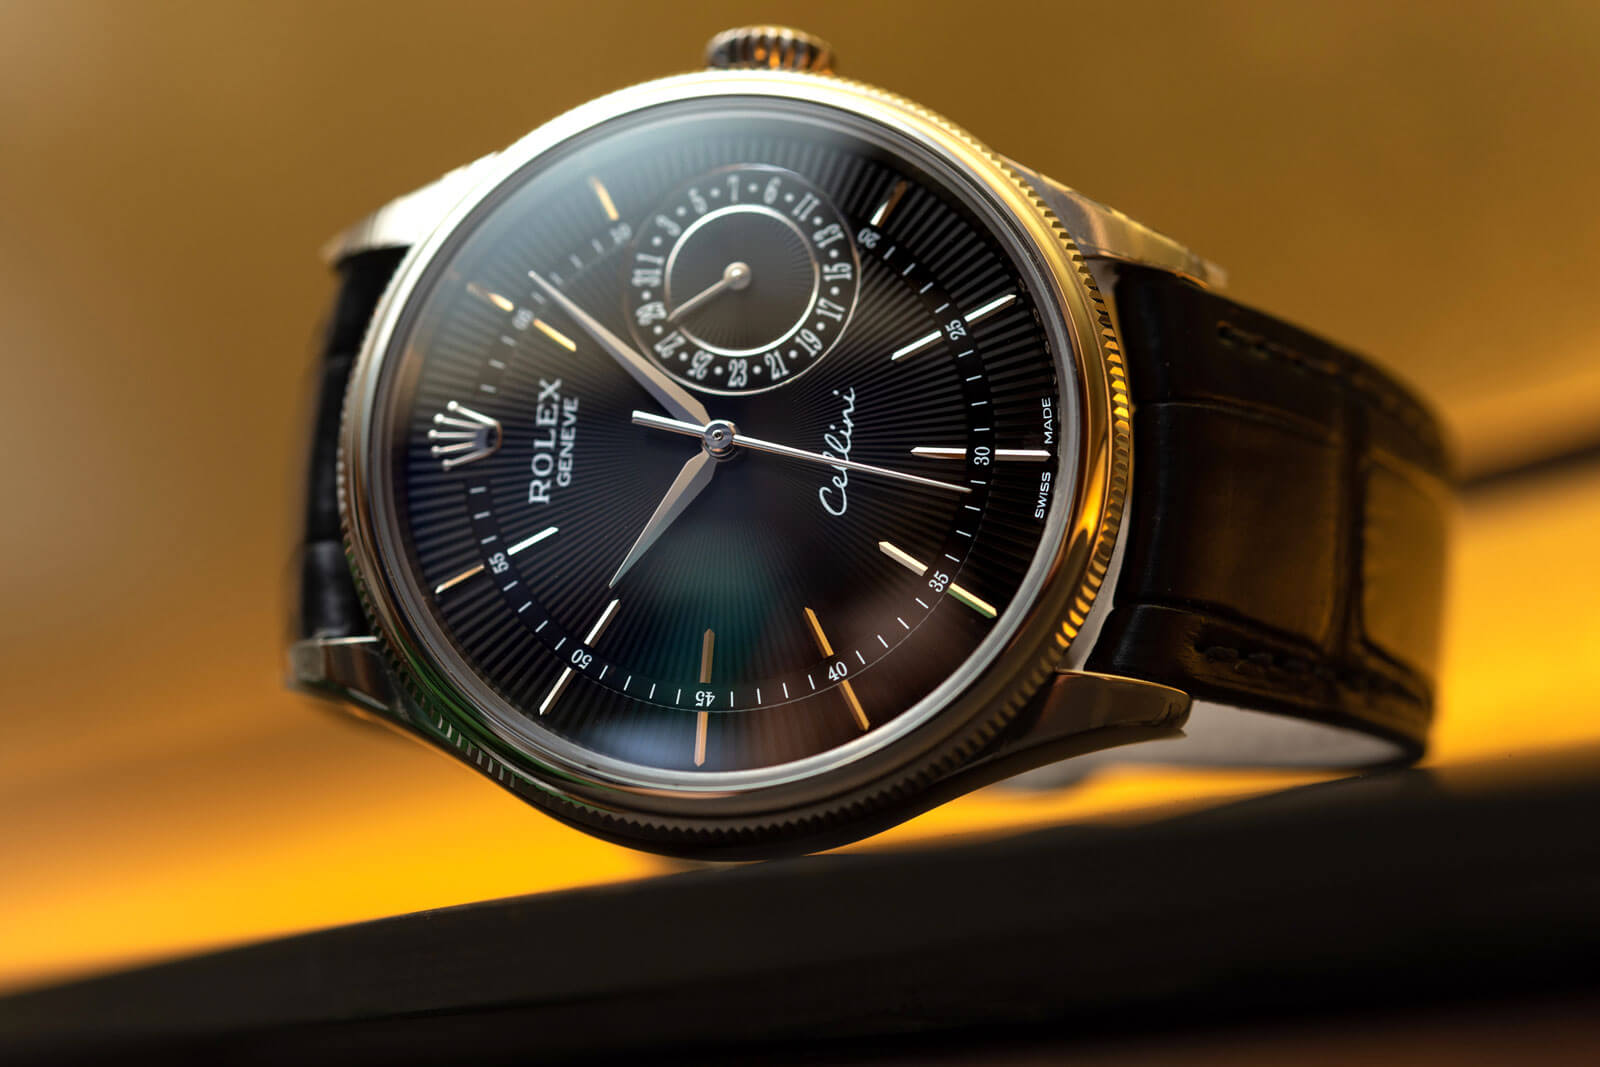 Rolex Cellini Date - Ref. 50519